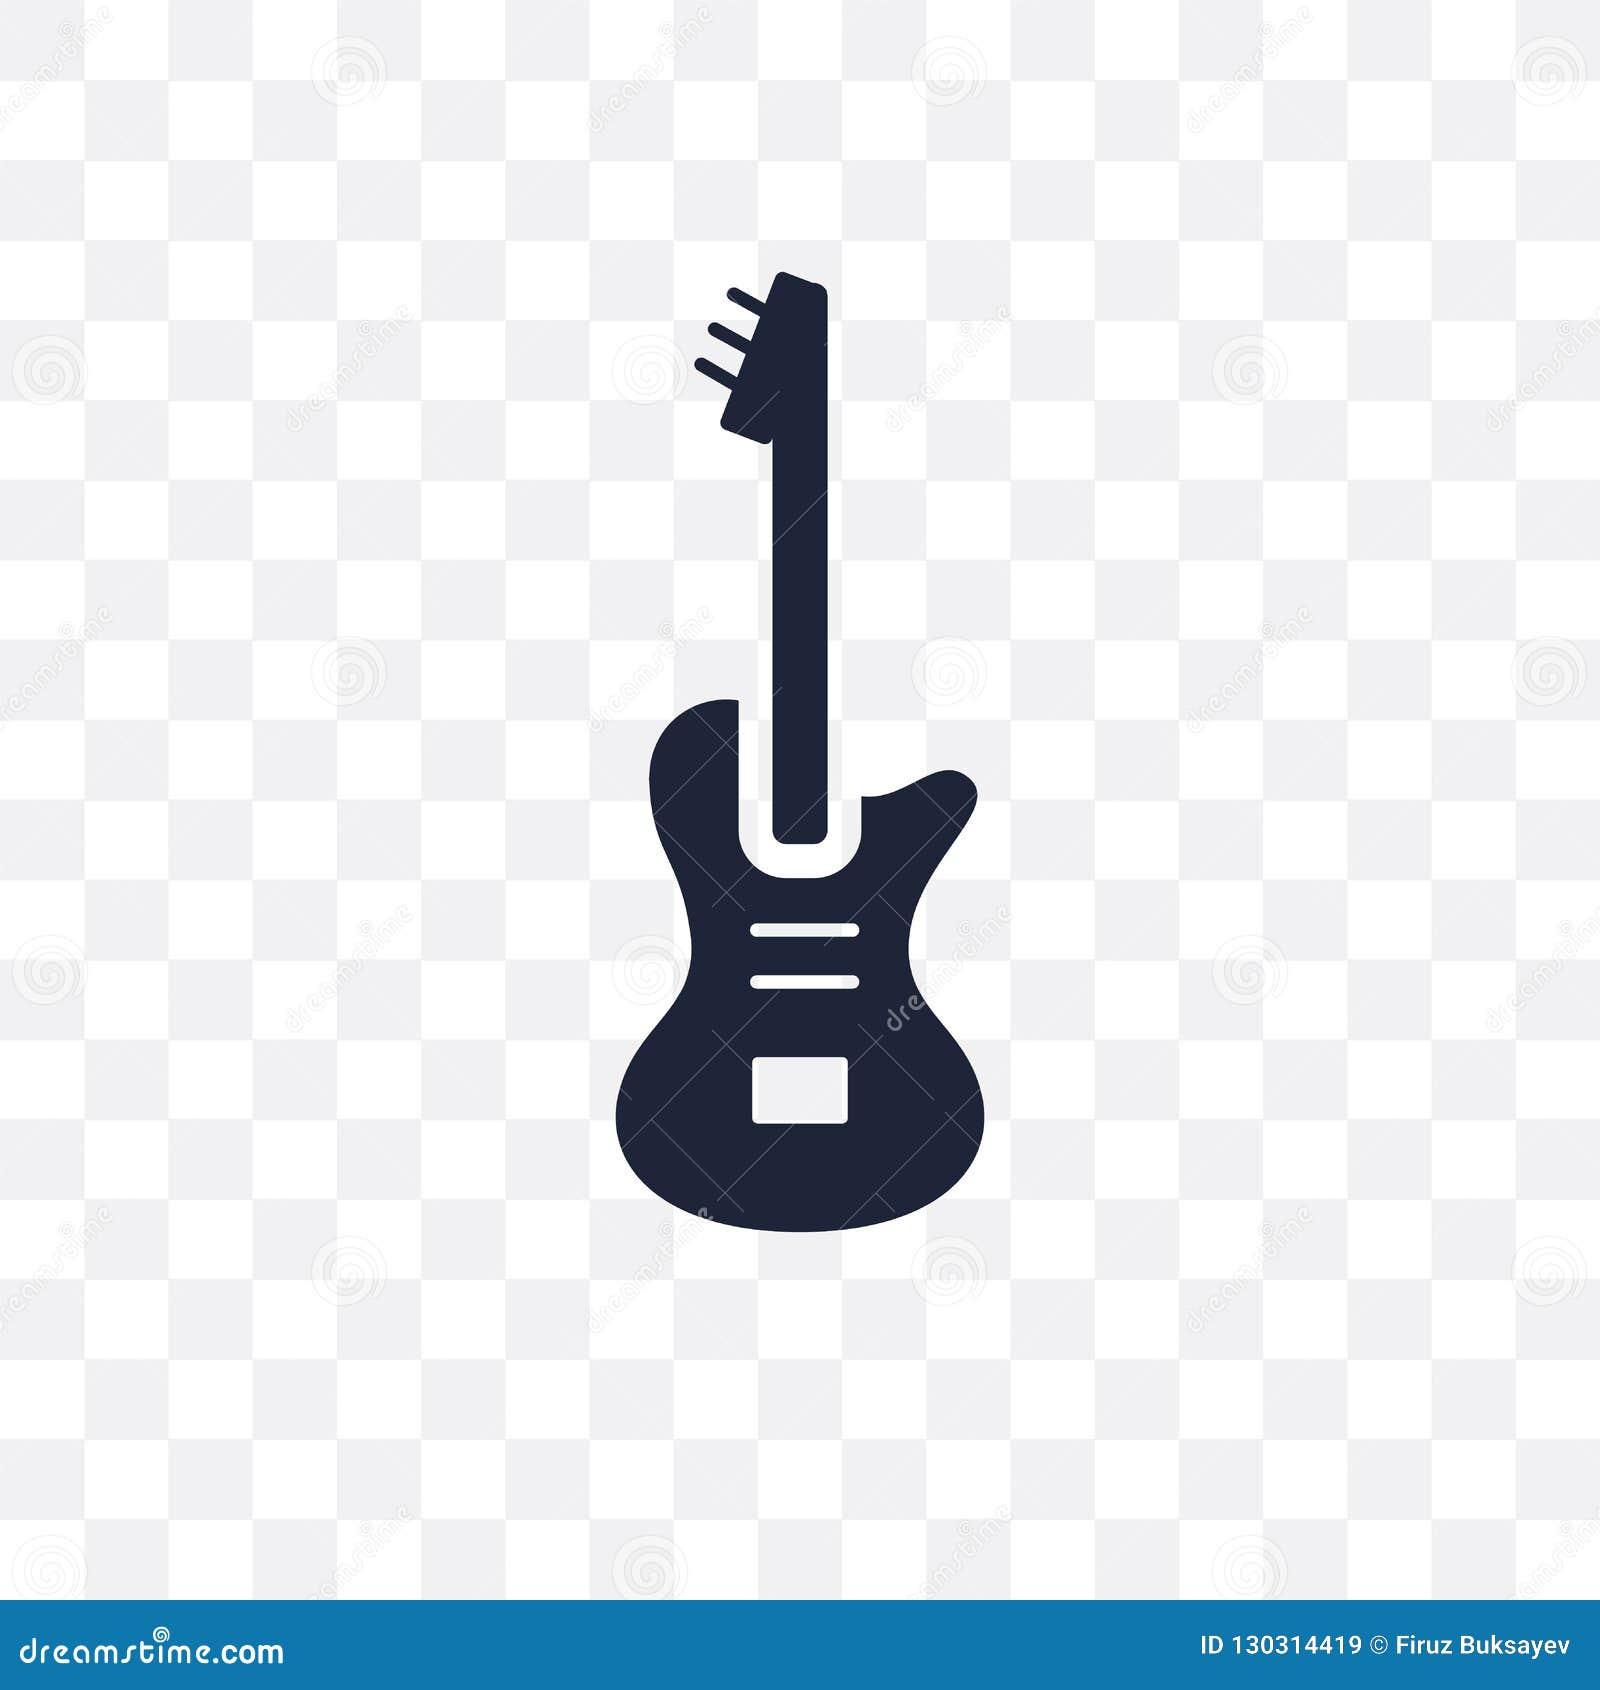 Electric Guitar Transparent Icon Electric Guitar Symbol Design Stock Vector Illustration Of Vector Concept 130314419